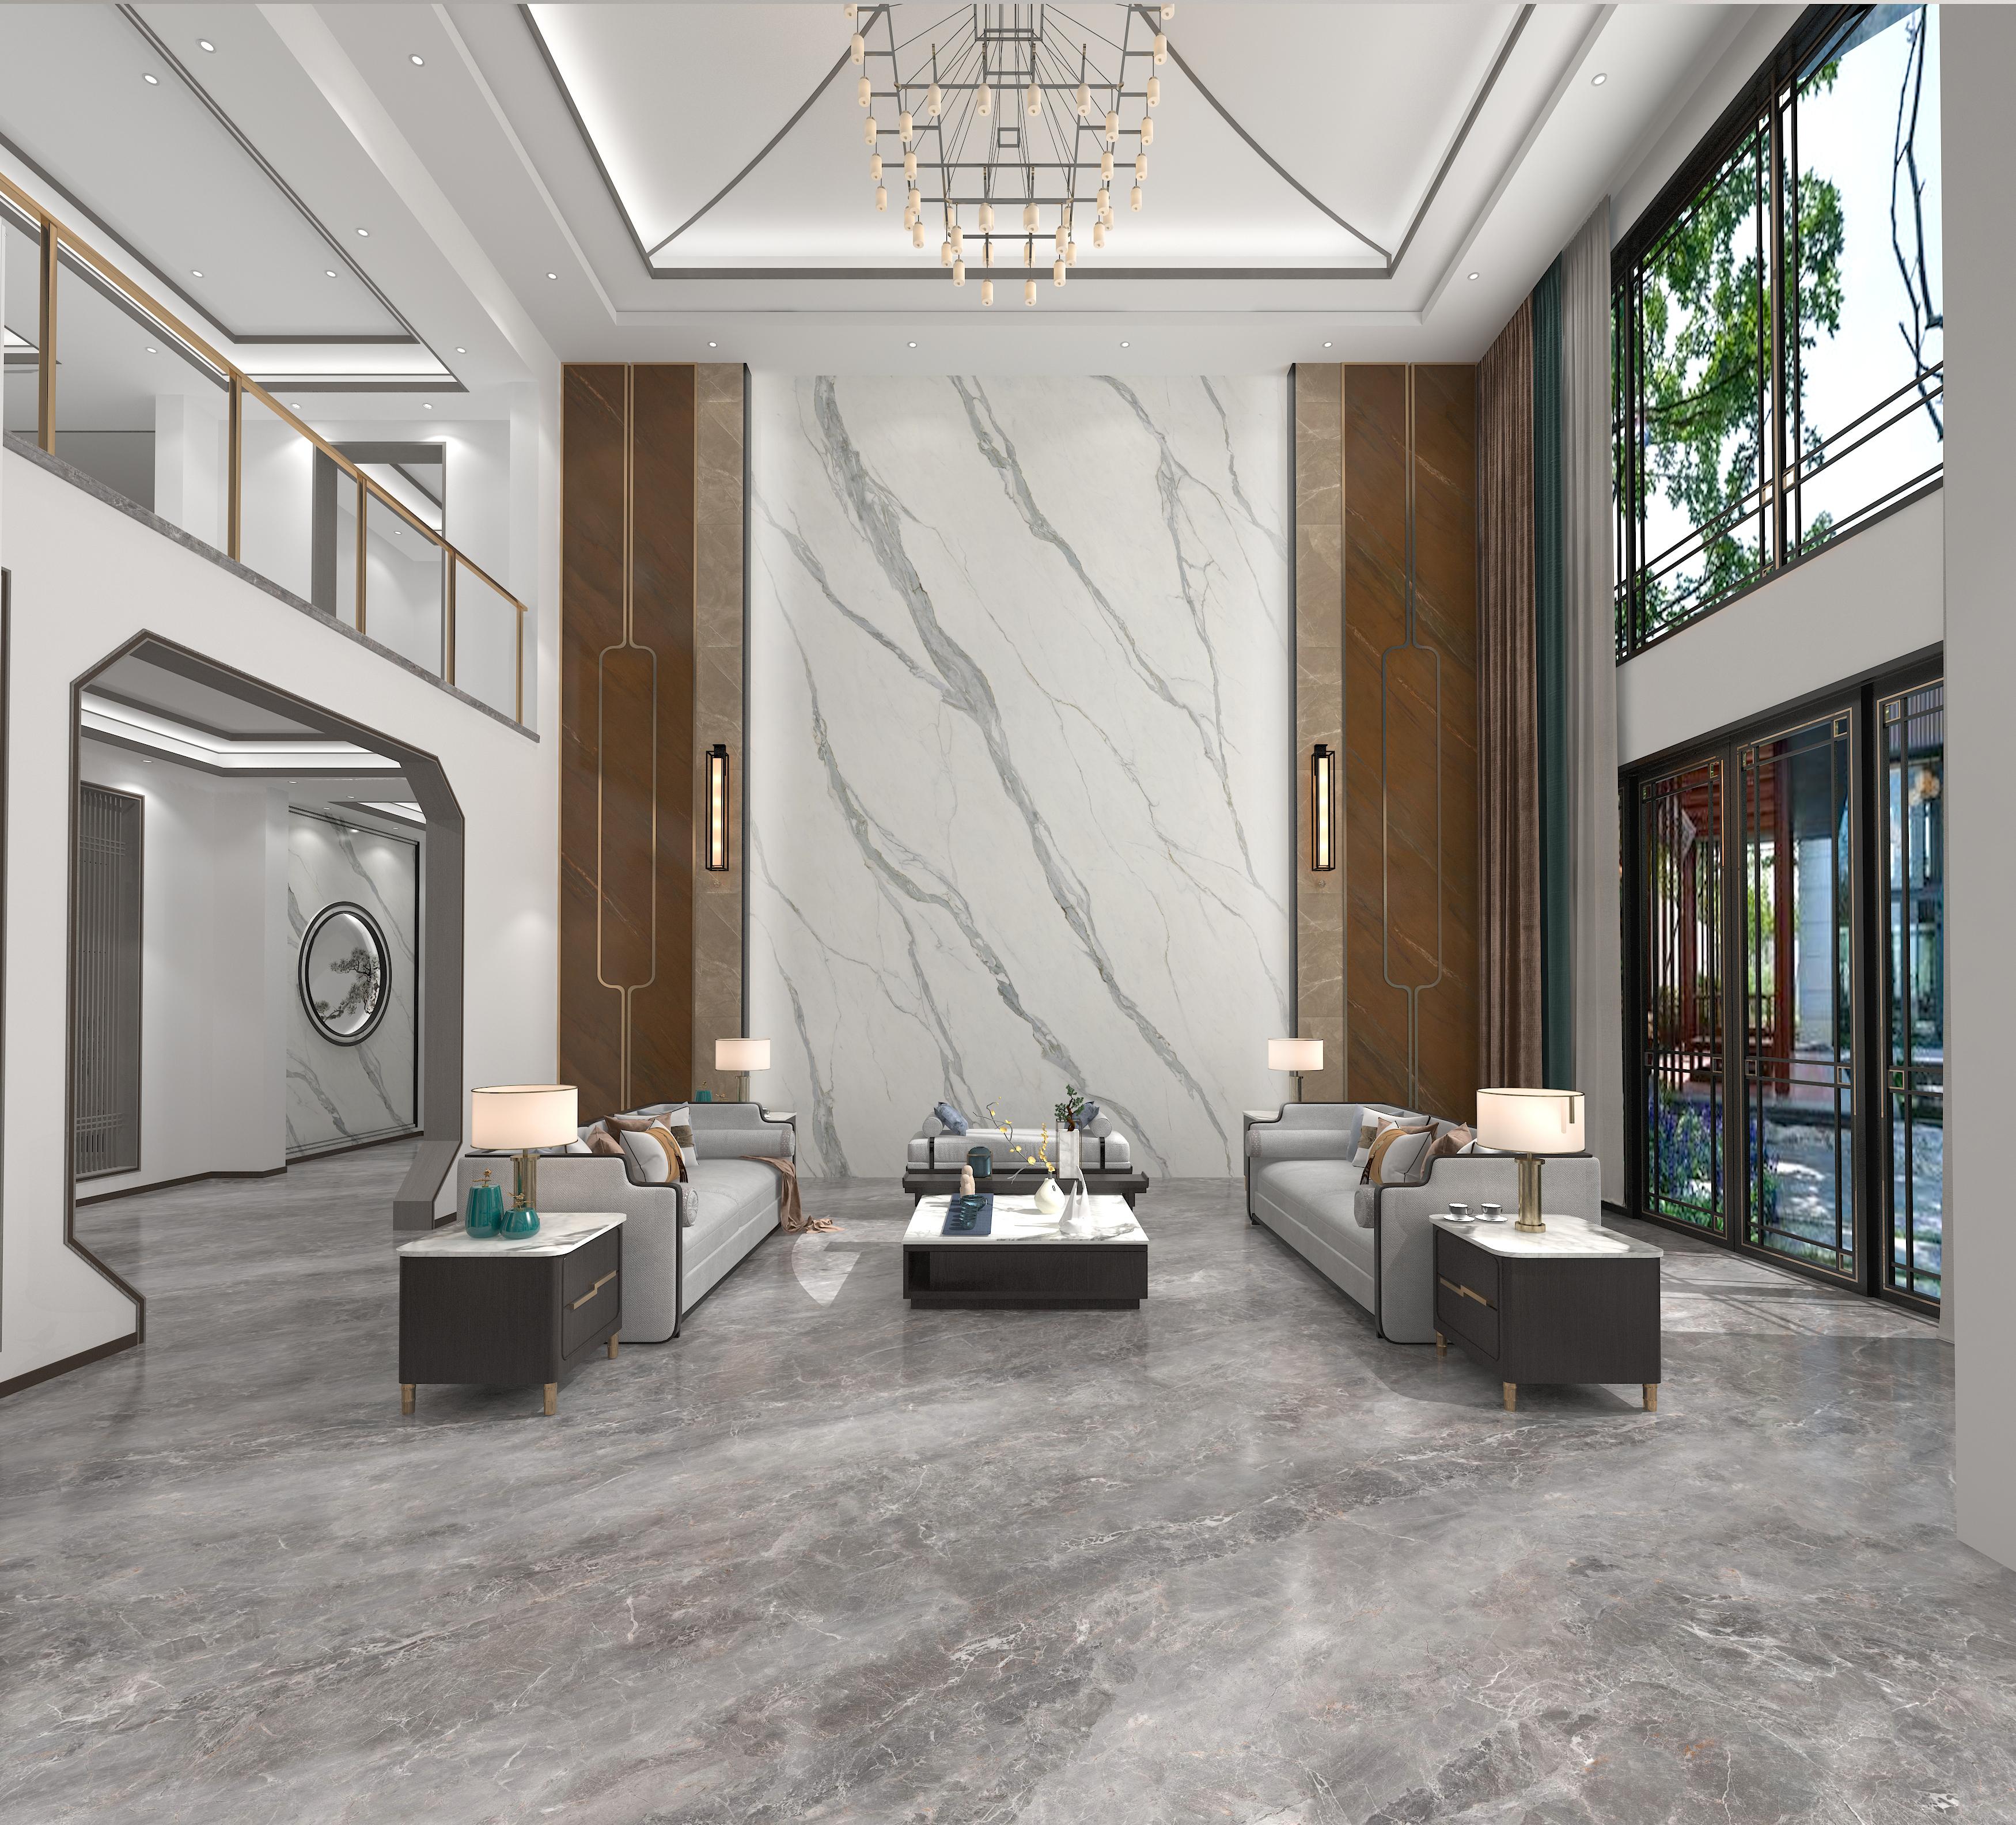 Maui Grey Marble Tiles Manufacturers, Maui Grey Marble Tiles Factory, Supply Maui Grey Marble Tiles